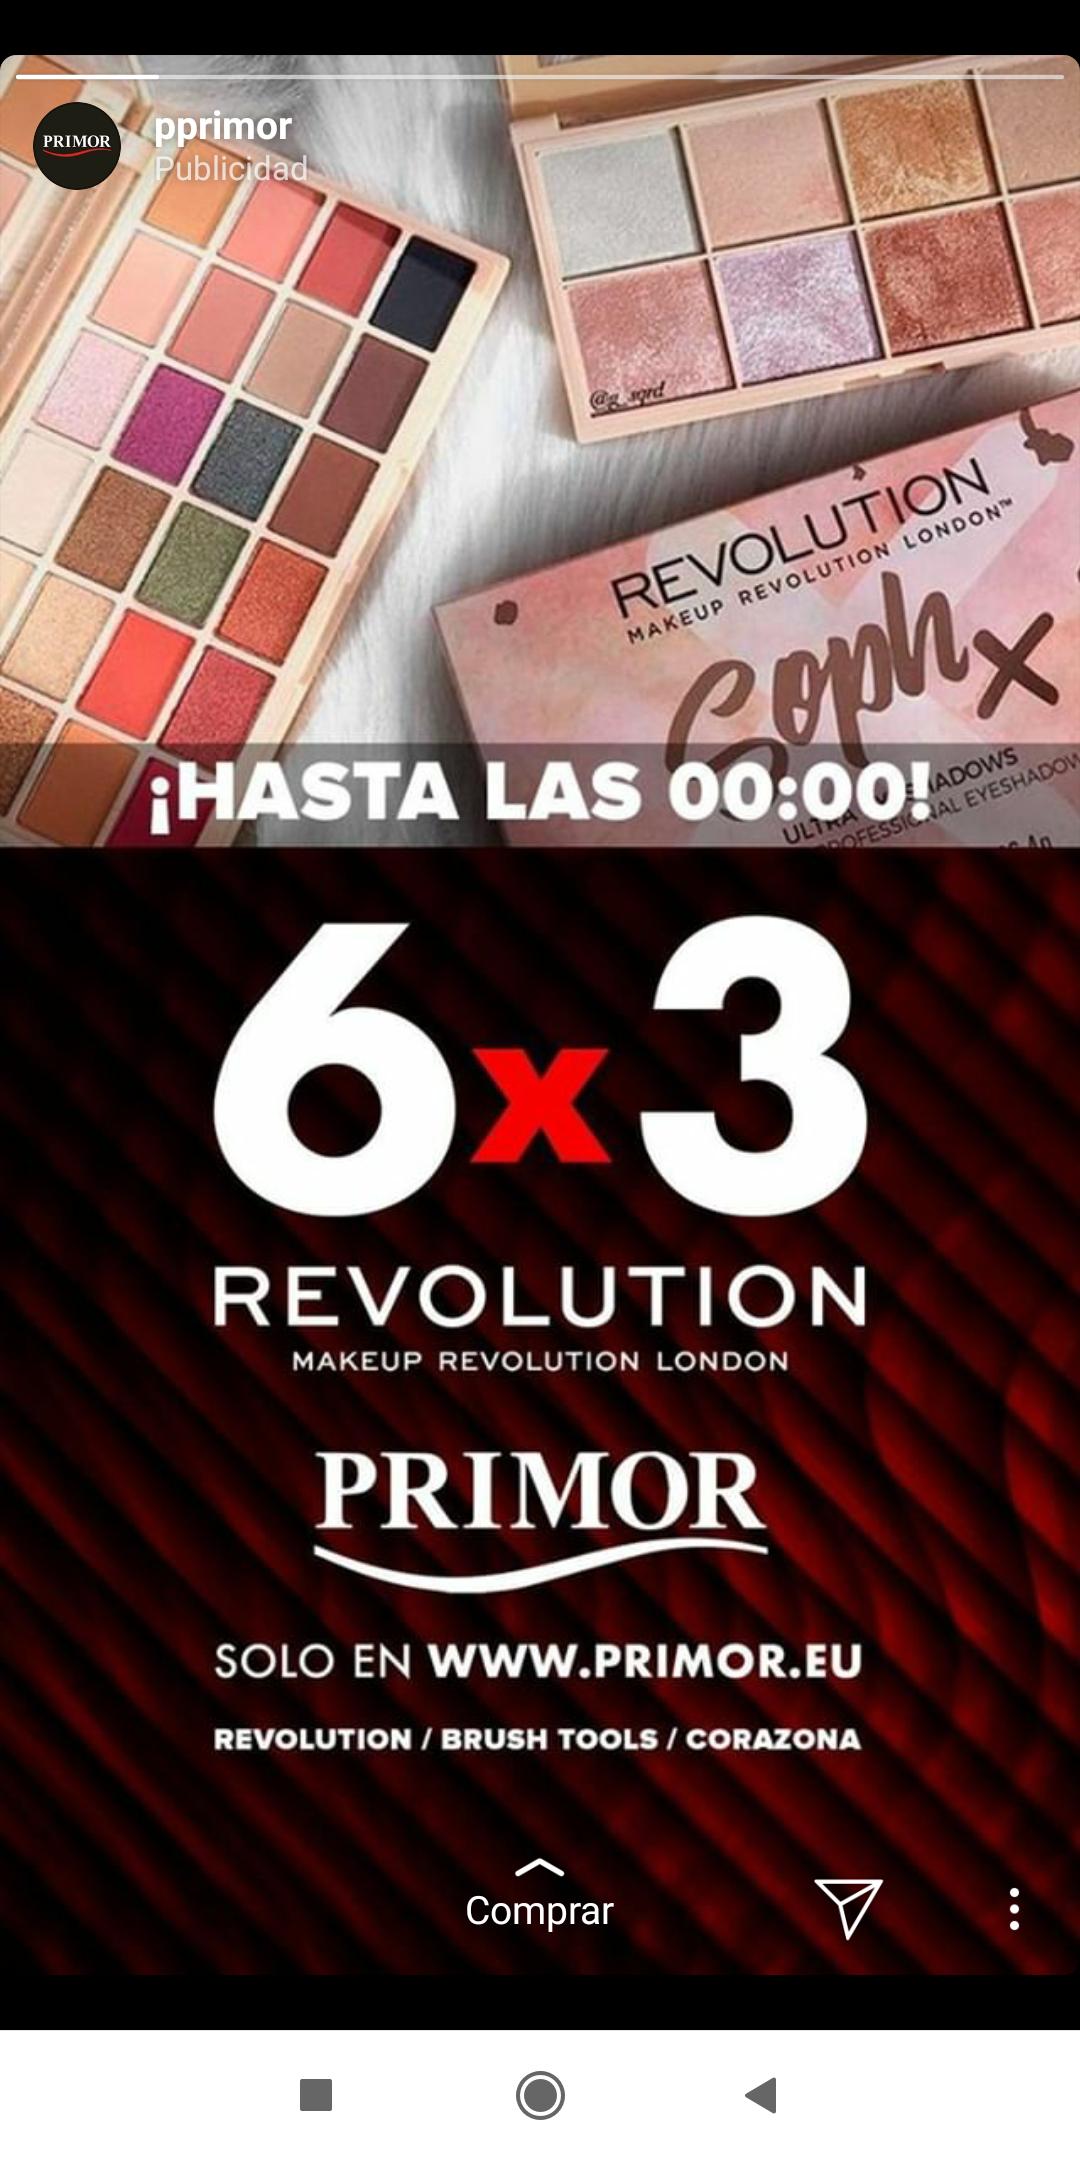 6x3 en Revolution (primor)